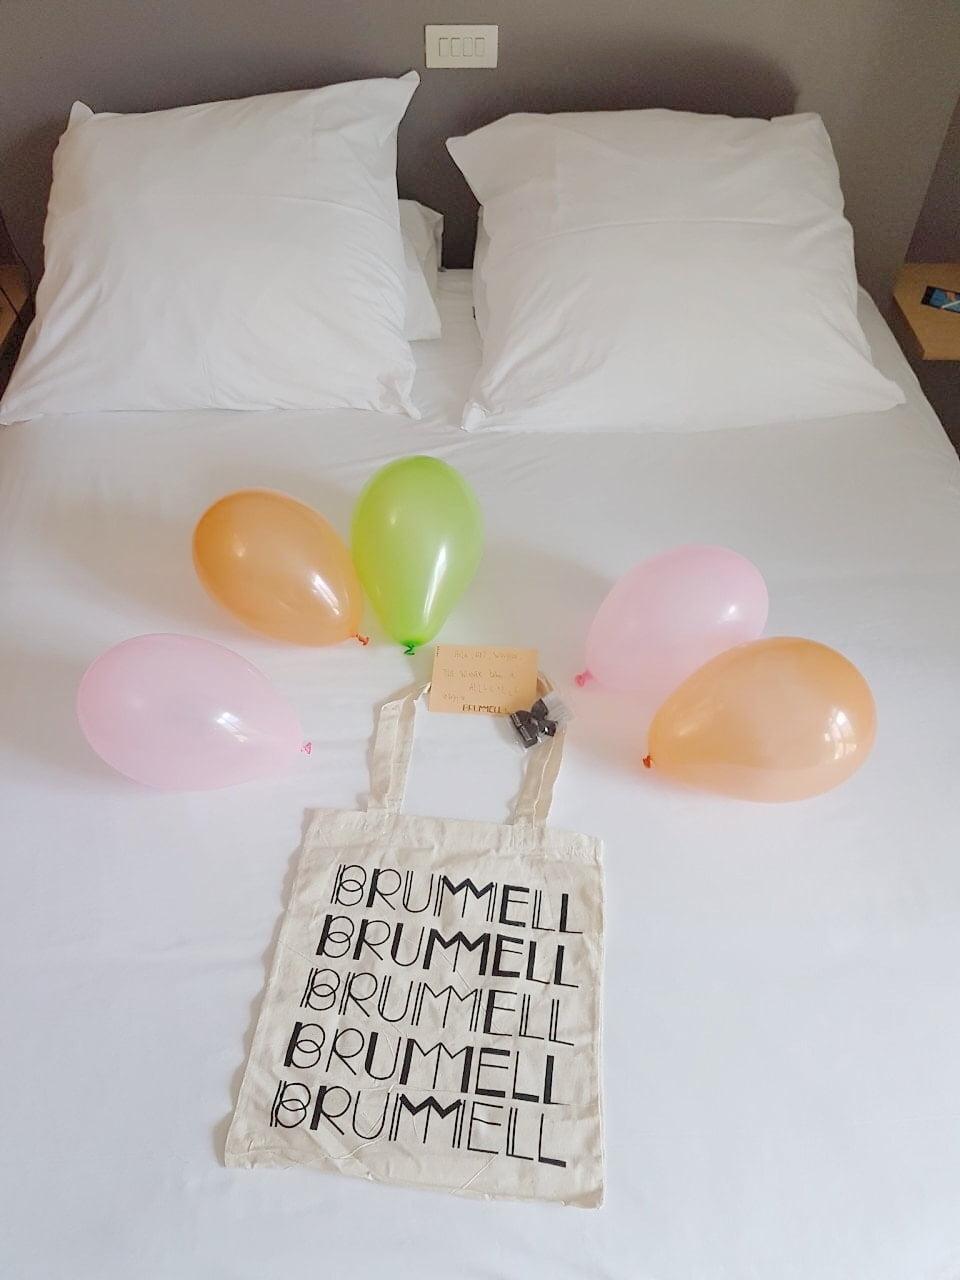 Welcome Hotel Brummell